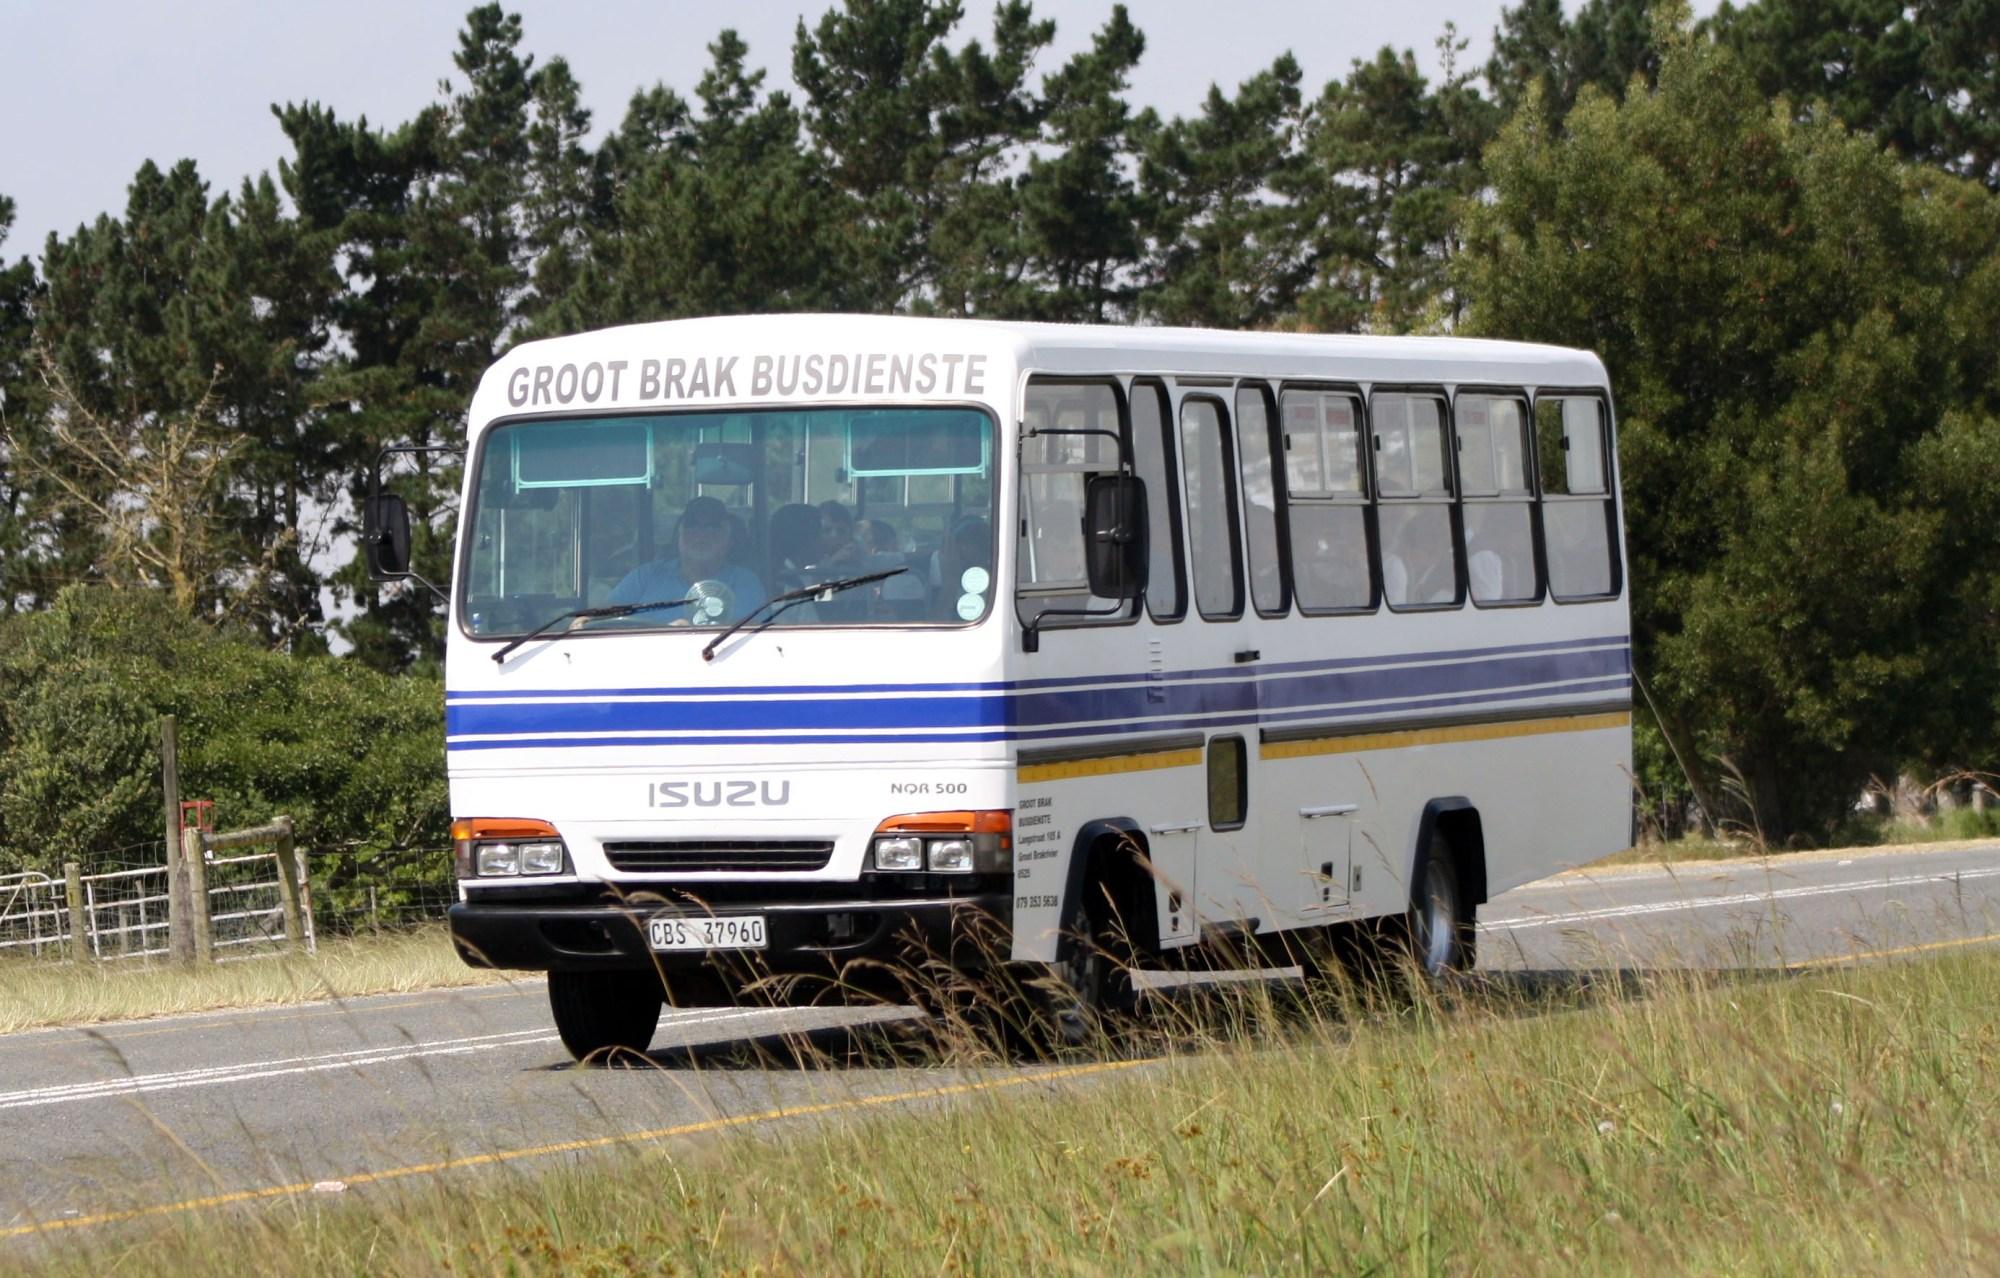 hight resolution of file groot brak busdienste isuzu nqr 500 bus 24357180393 jpg